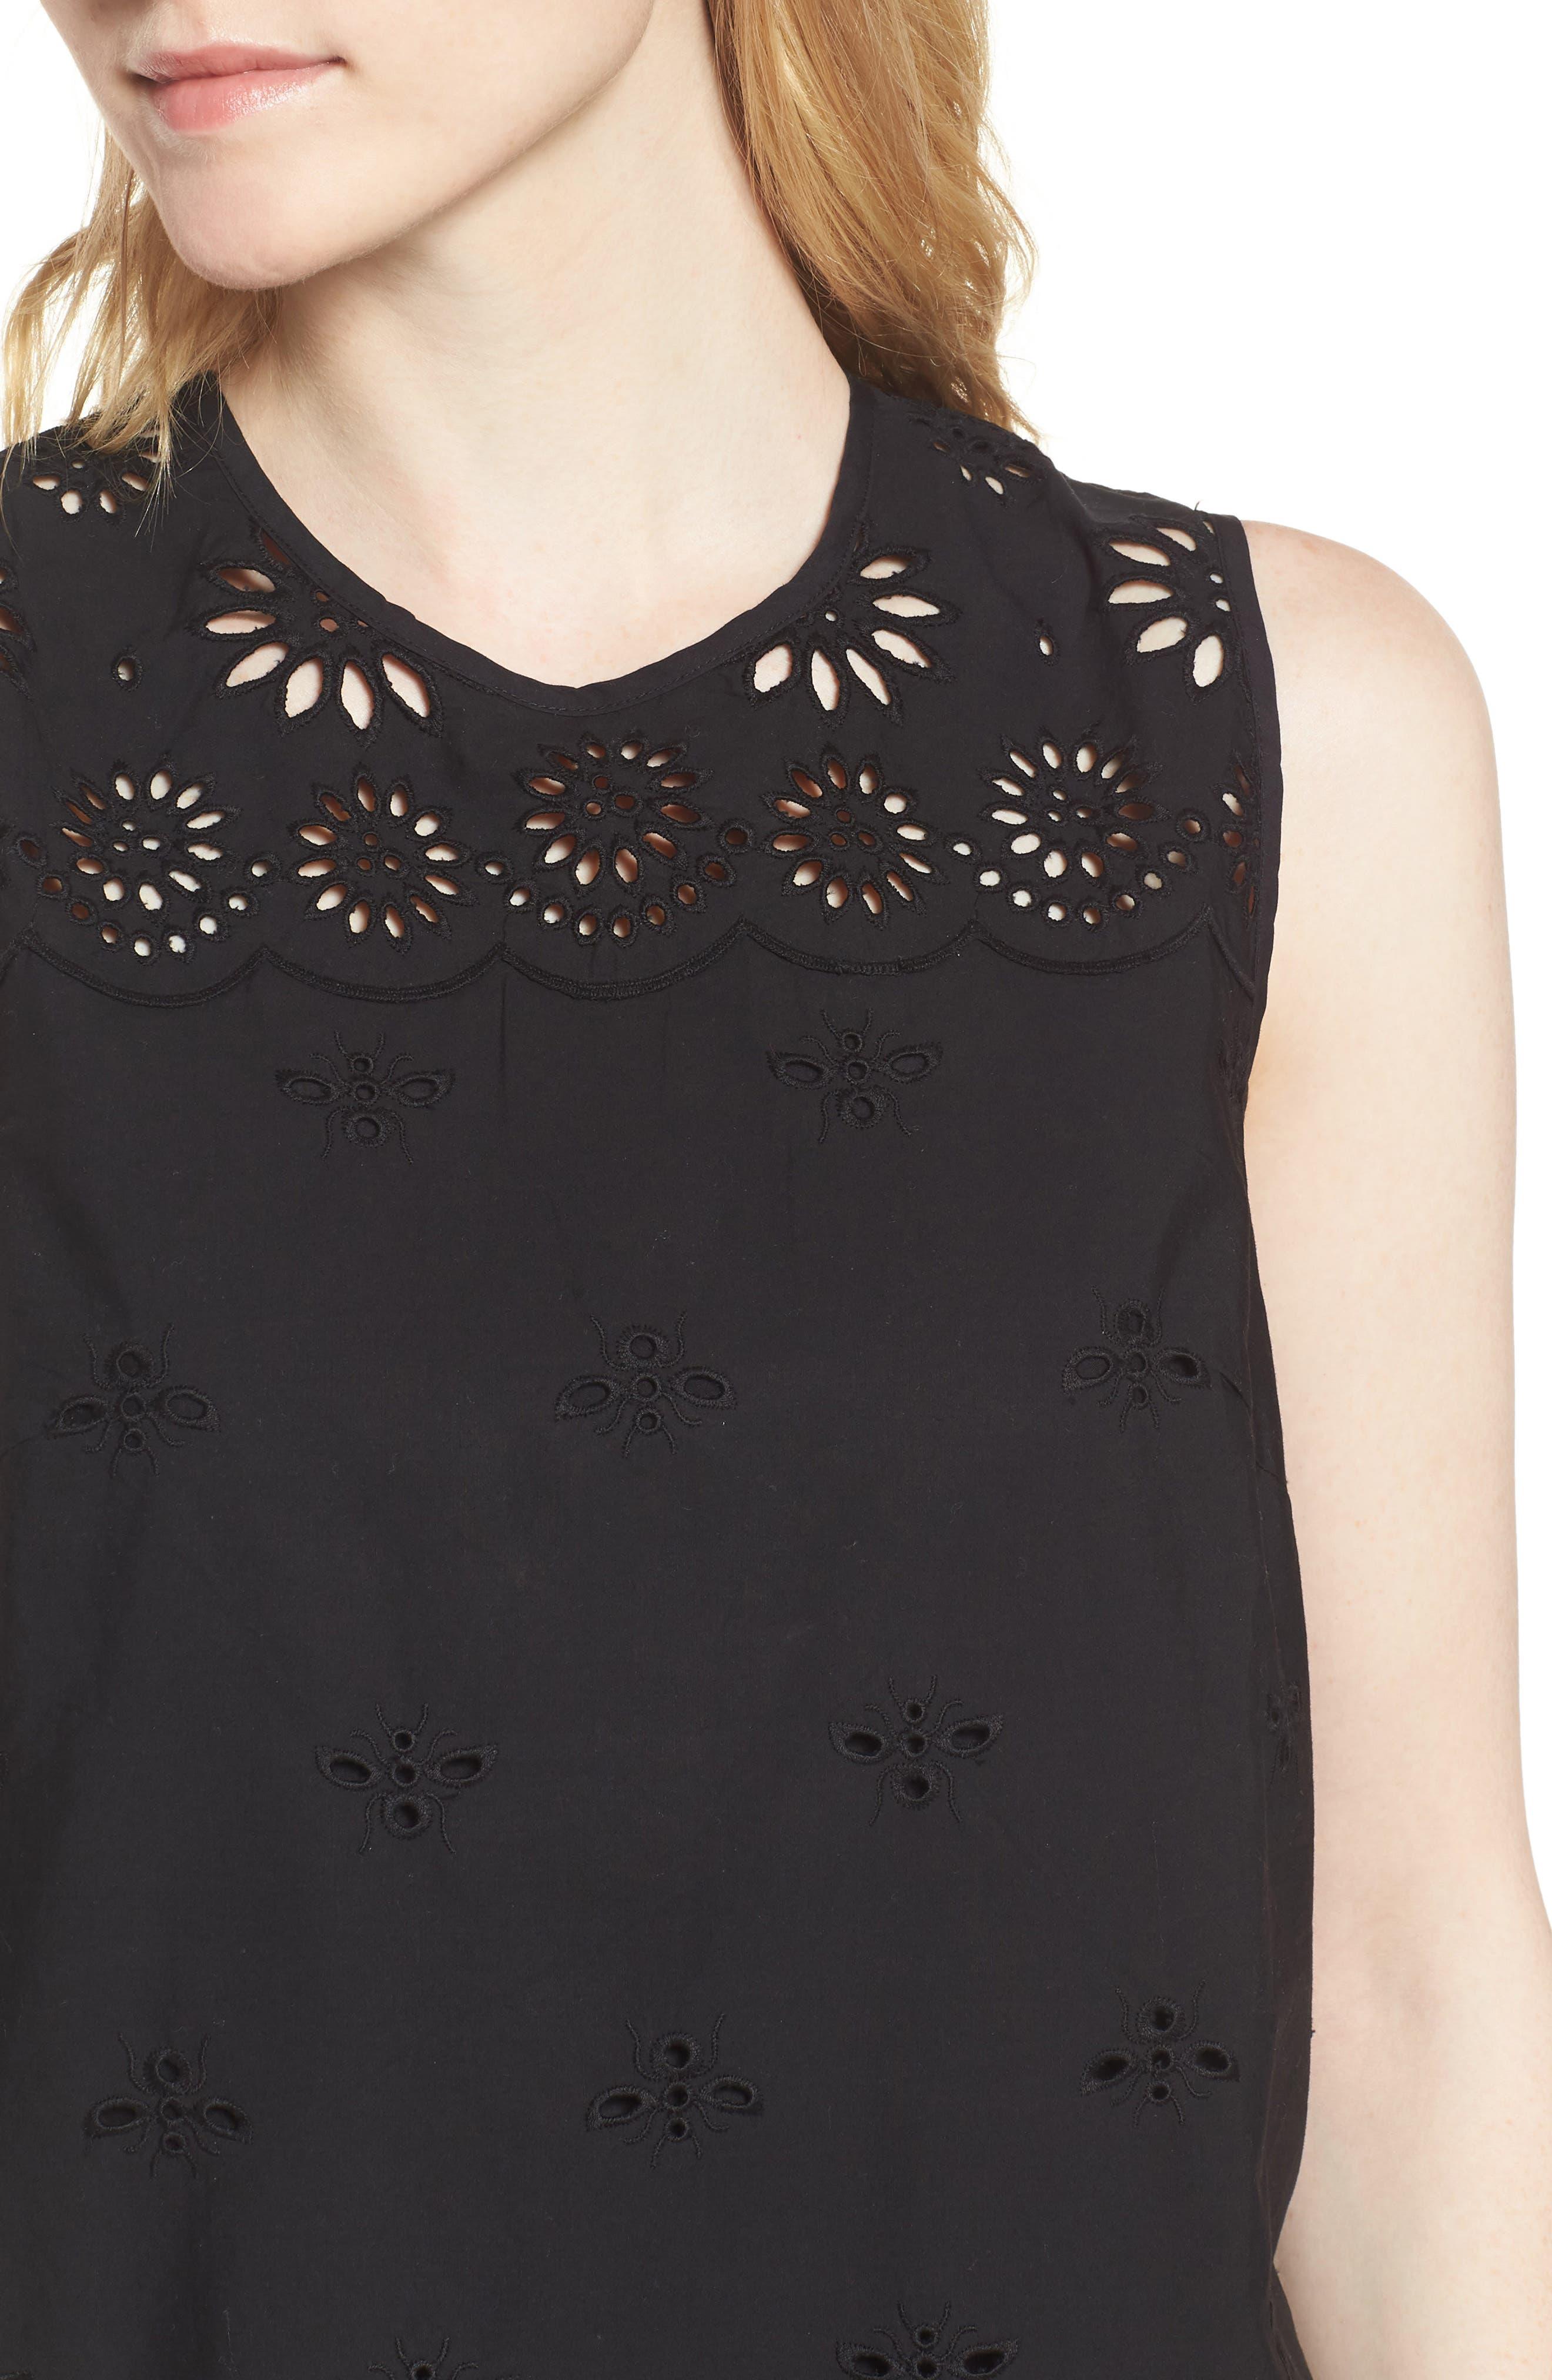 J.Crew Dante Yellowjacket Embroidery Dress,                             Alternate thumbnail 4, color,                             Black